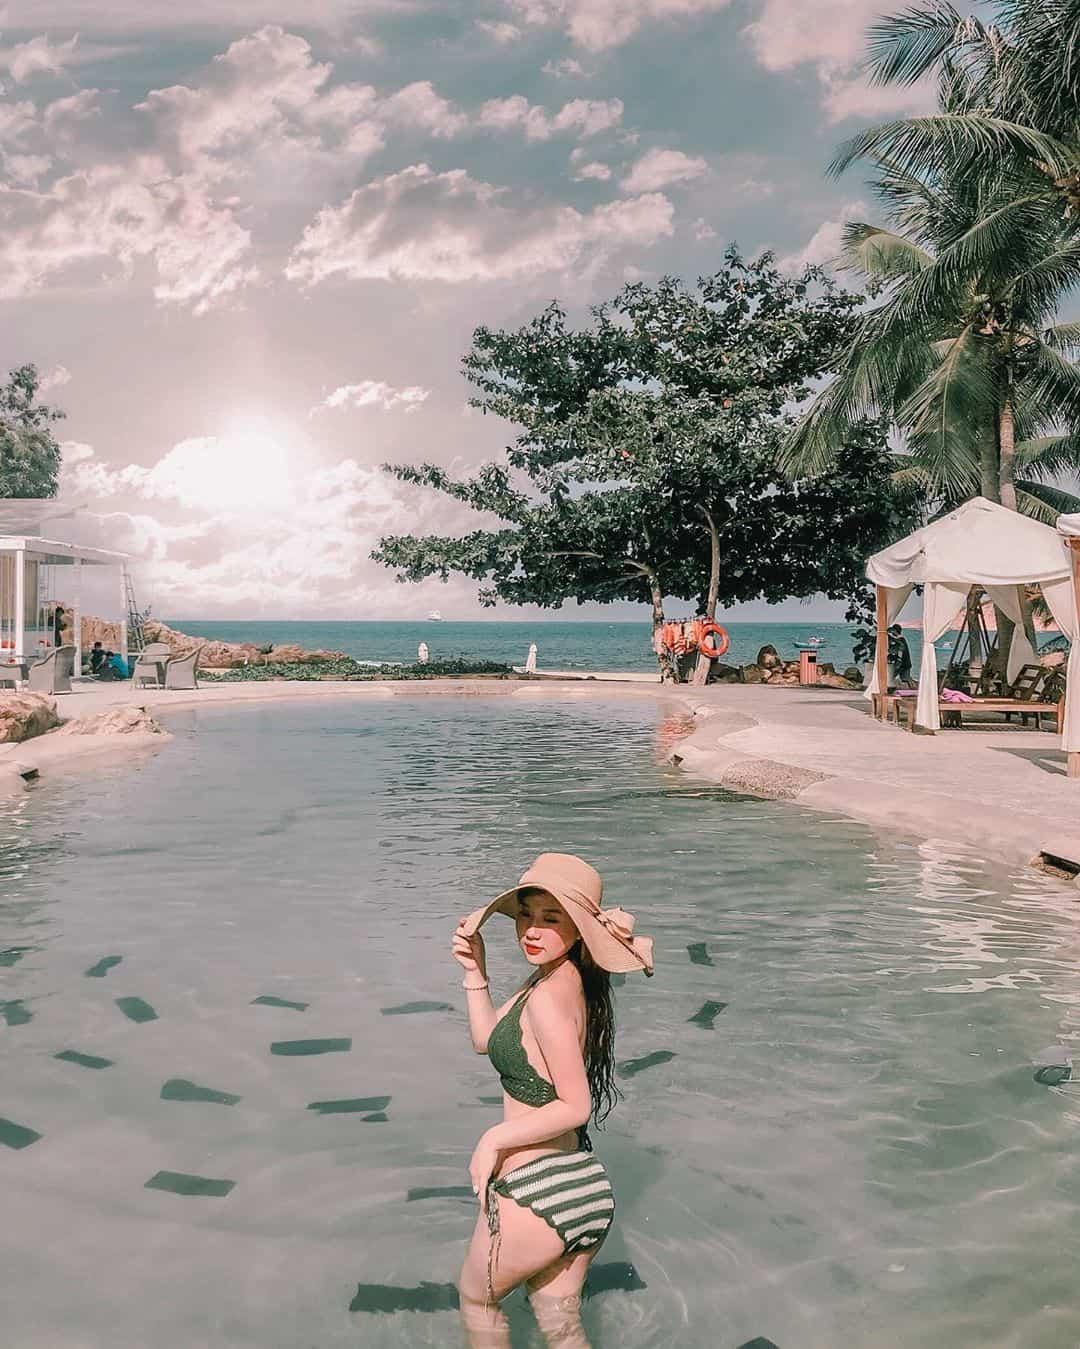 Bể bơi Casa Marina Resort. Hình: tammeomeo